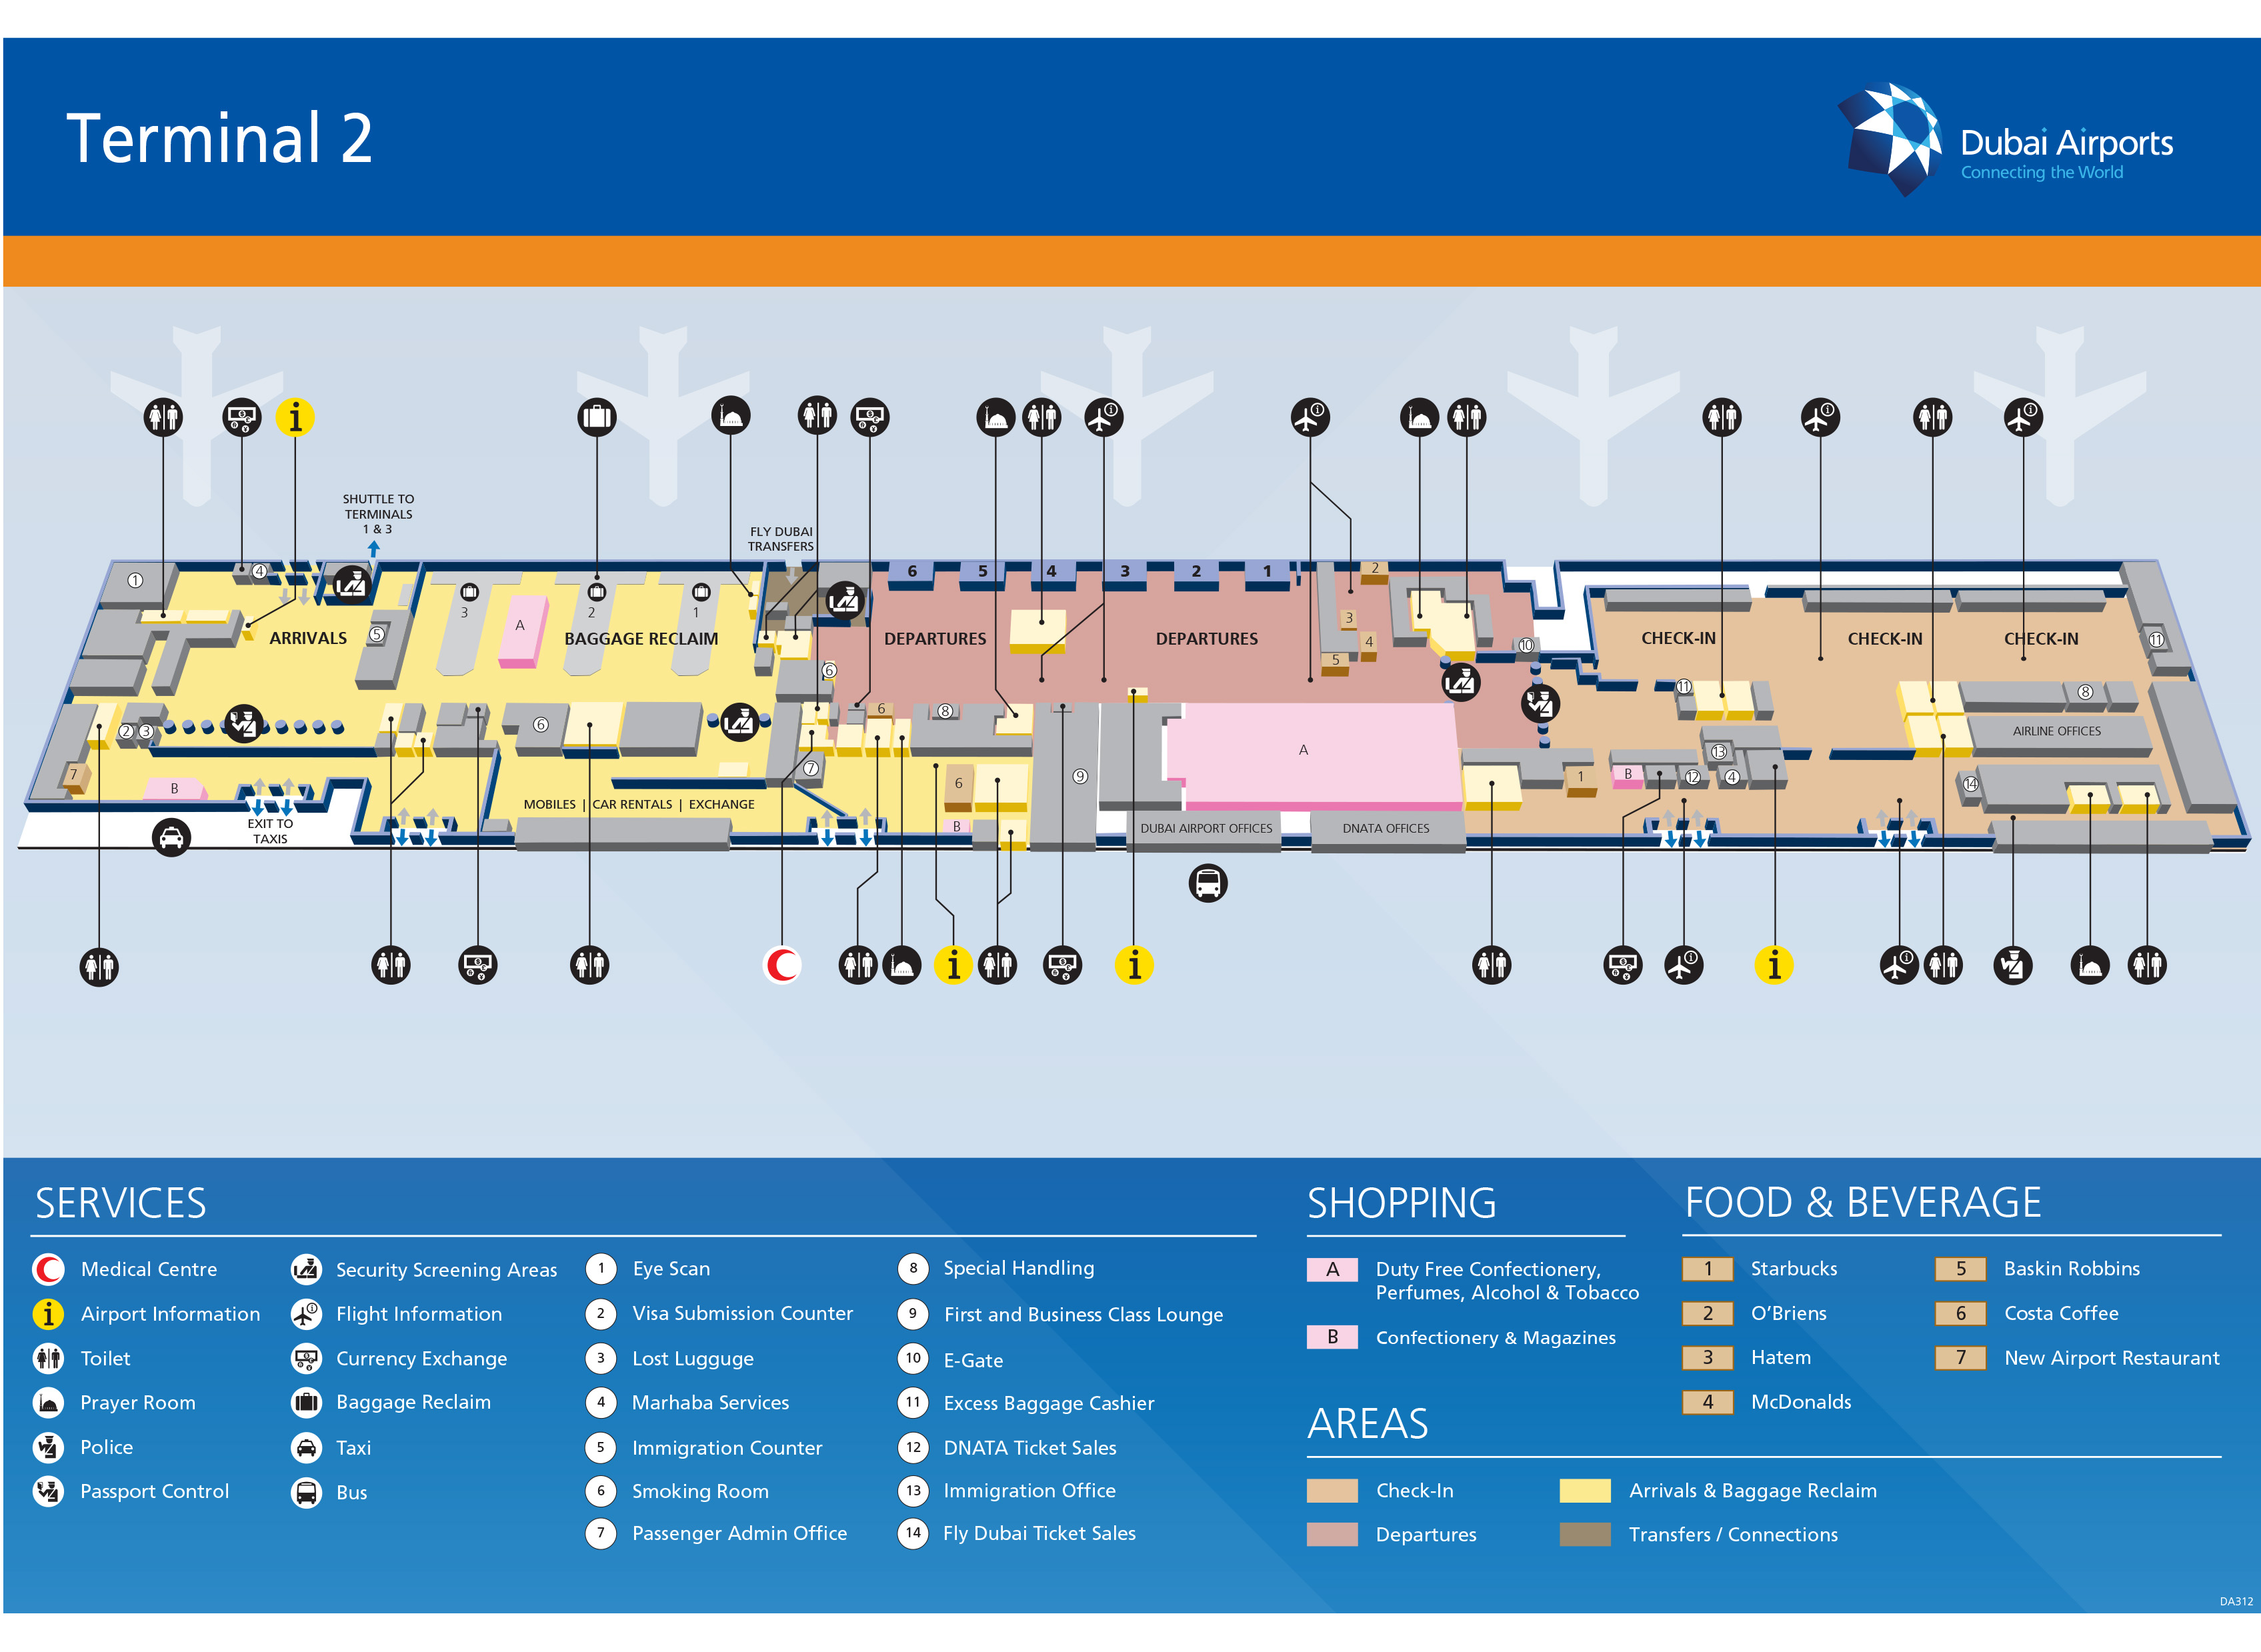 Dubai Airport Map (DXB) - Printable Terminal Maps, Shops, Food ... on